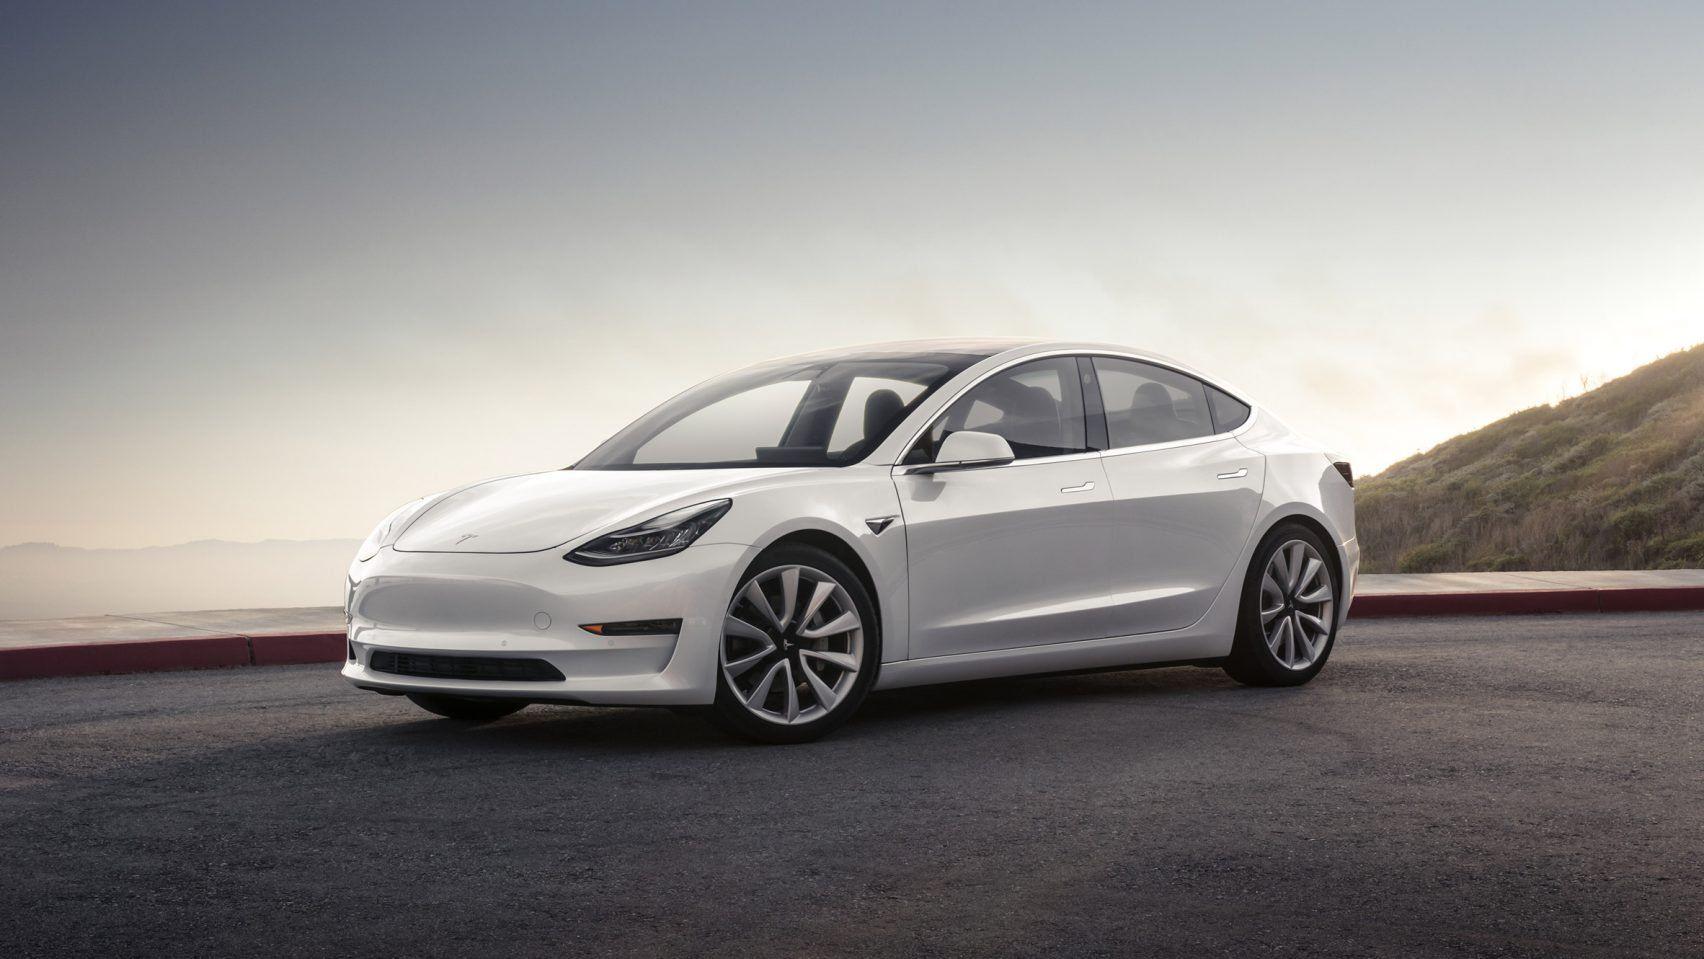 Tesla Unveils First Mass Market Electric Vehicle The Model 3 Tesla Model